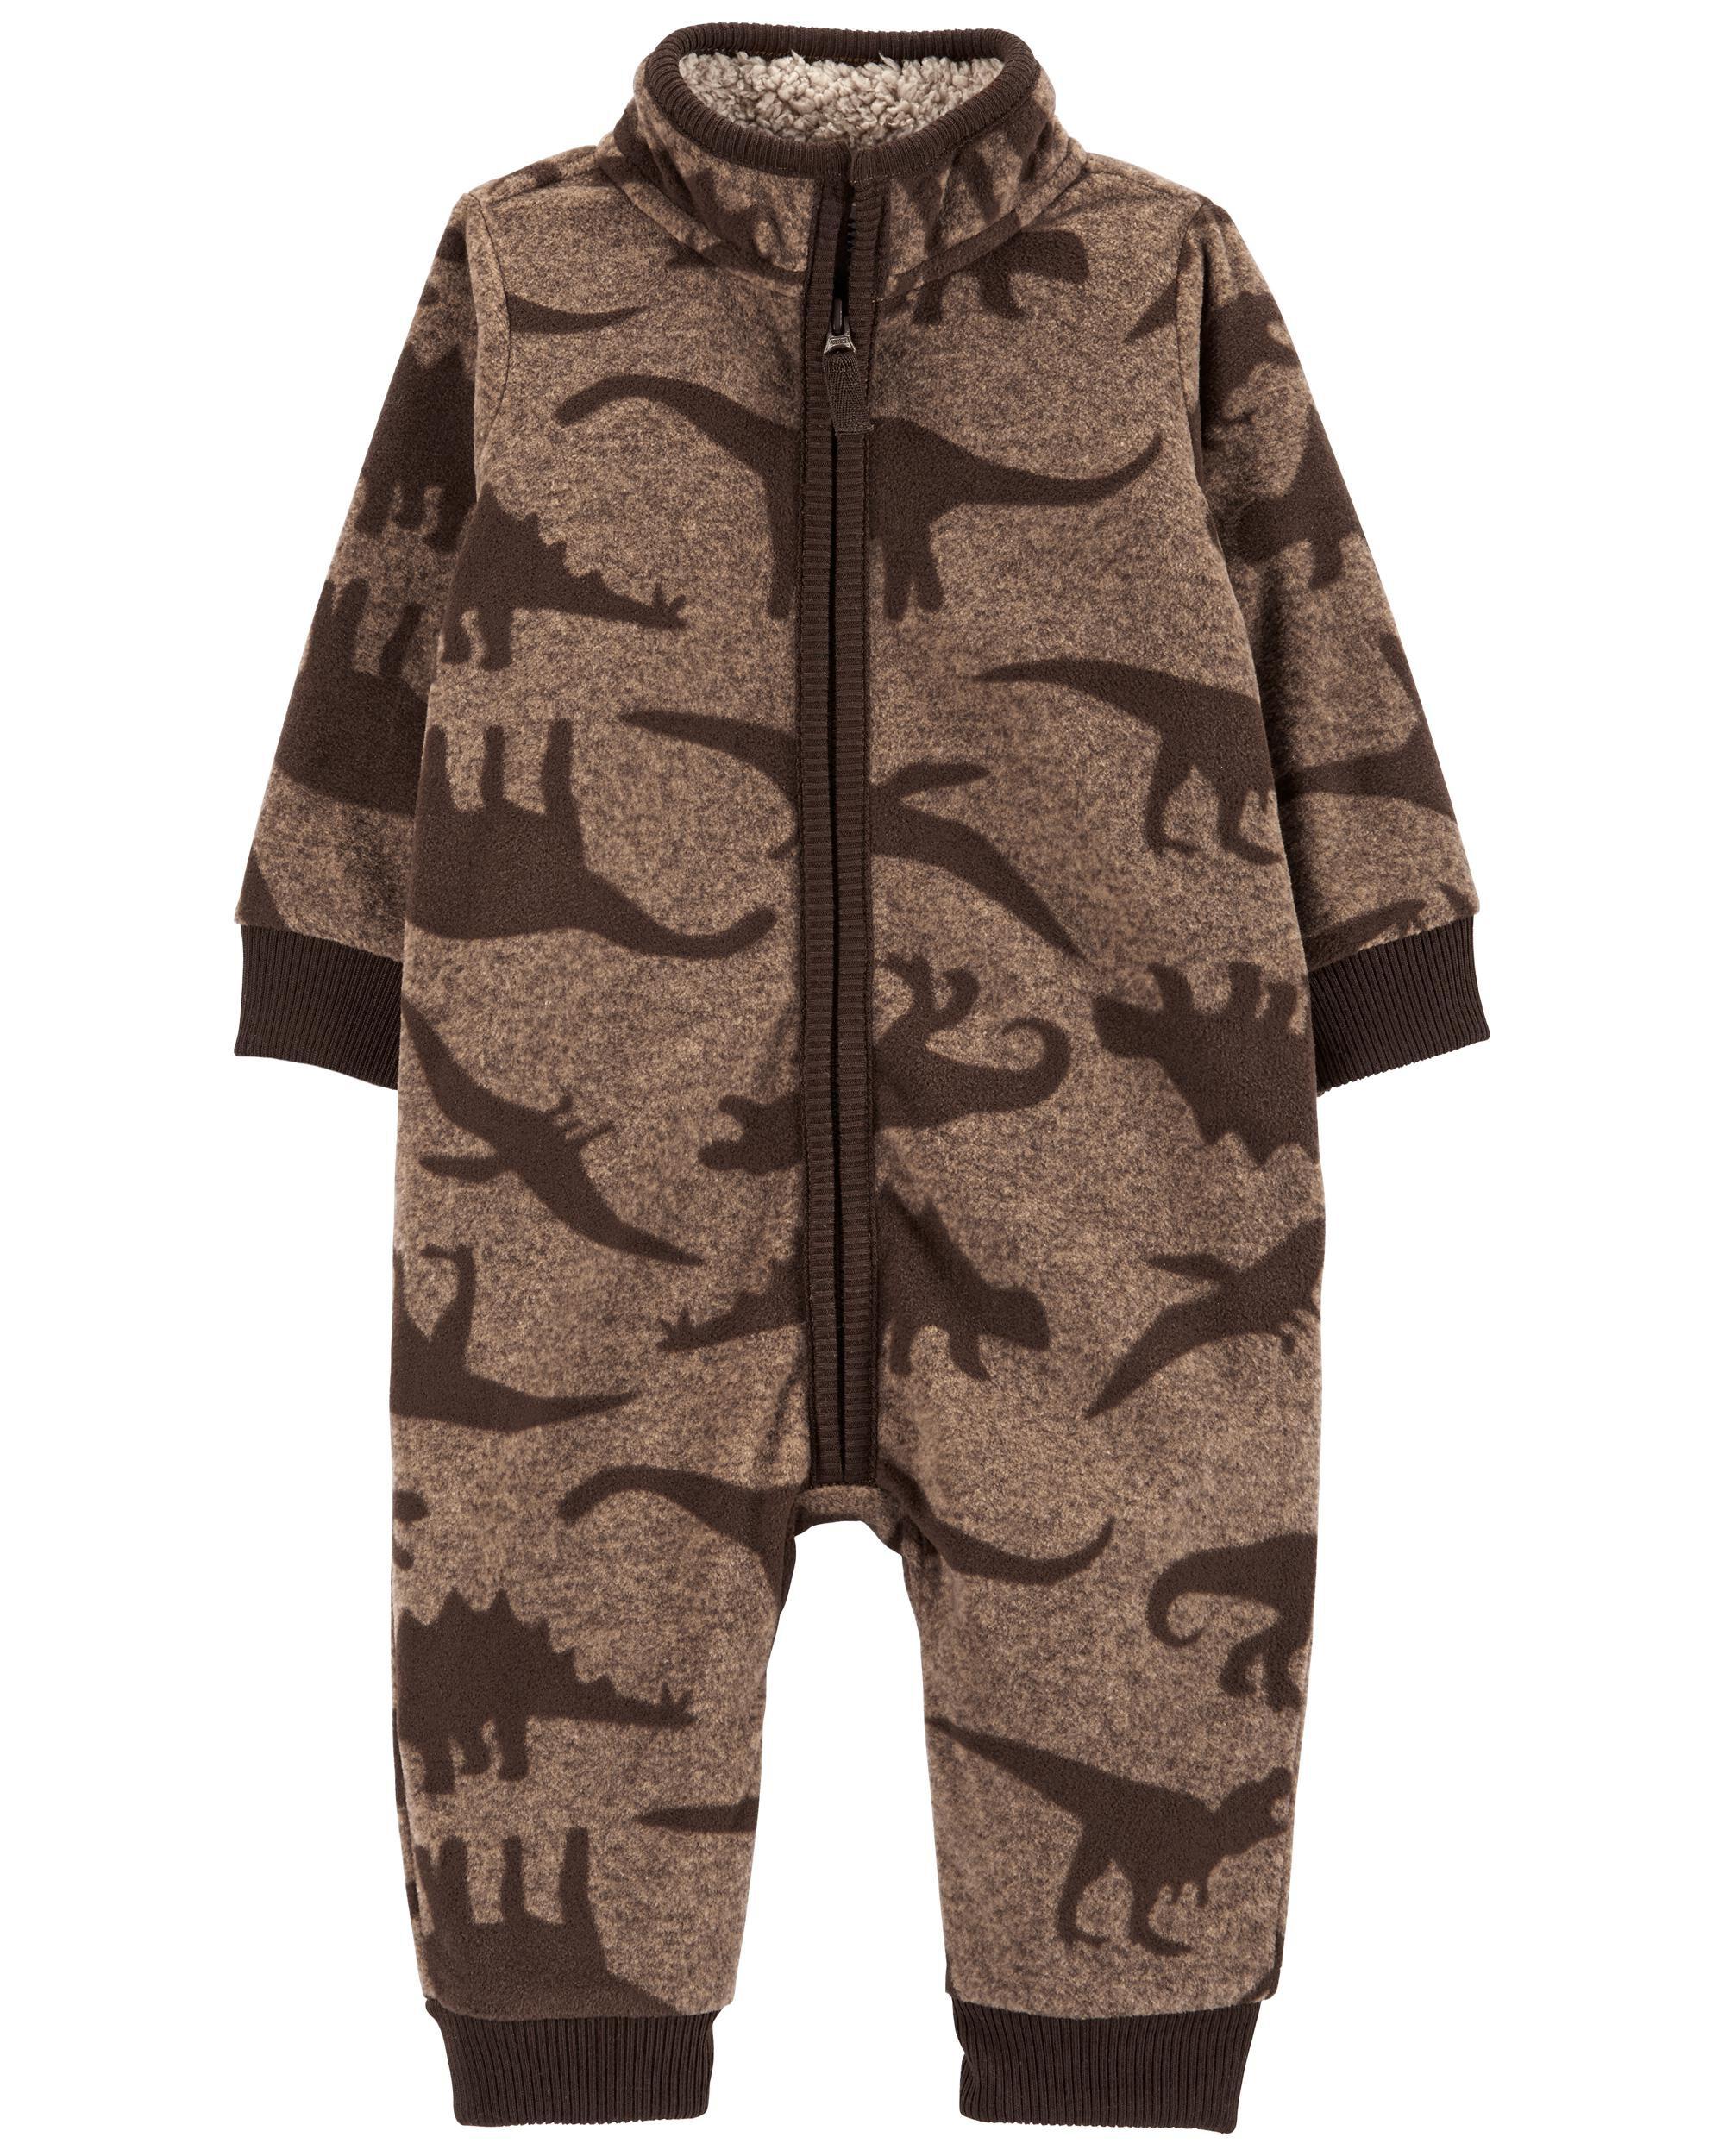 *CLEARANCE* Dinosaur Fleece Jumpsuit